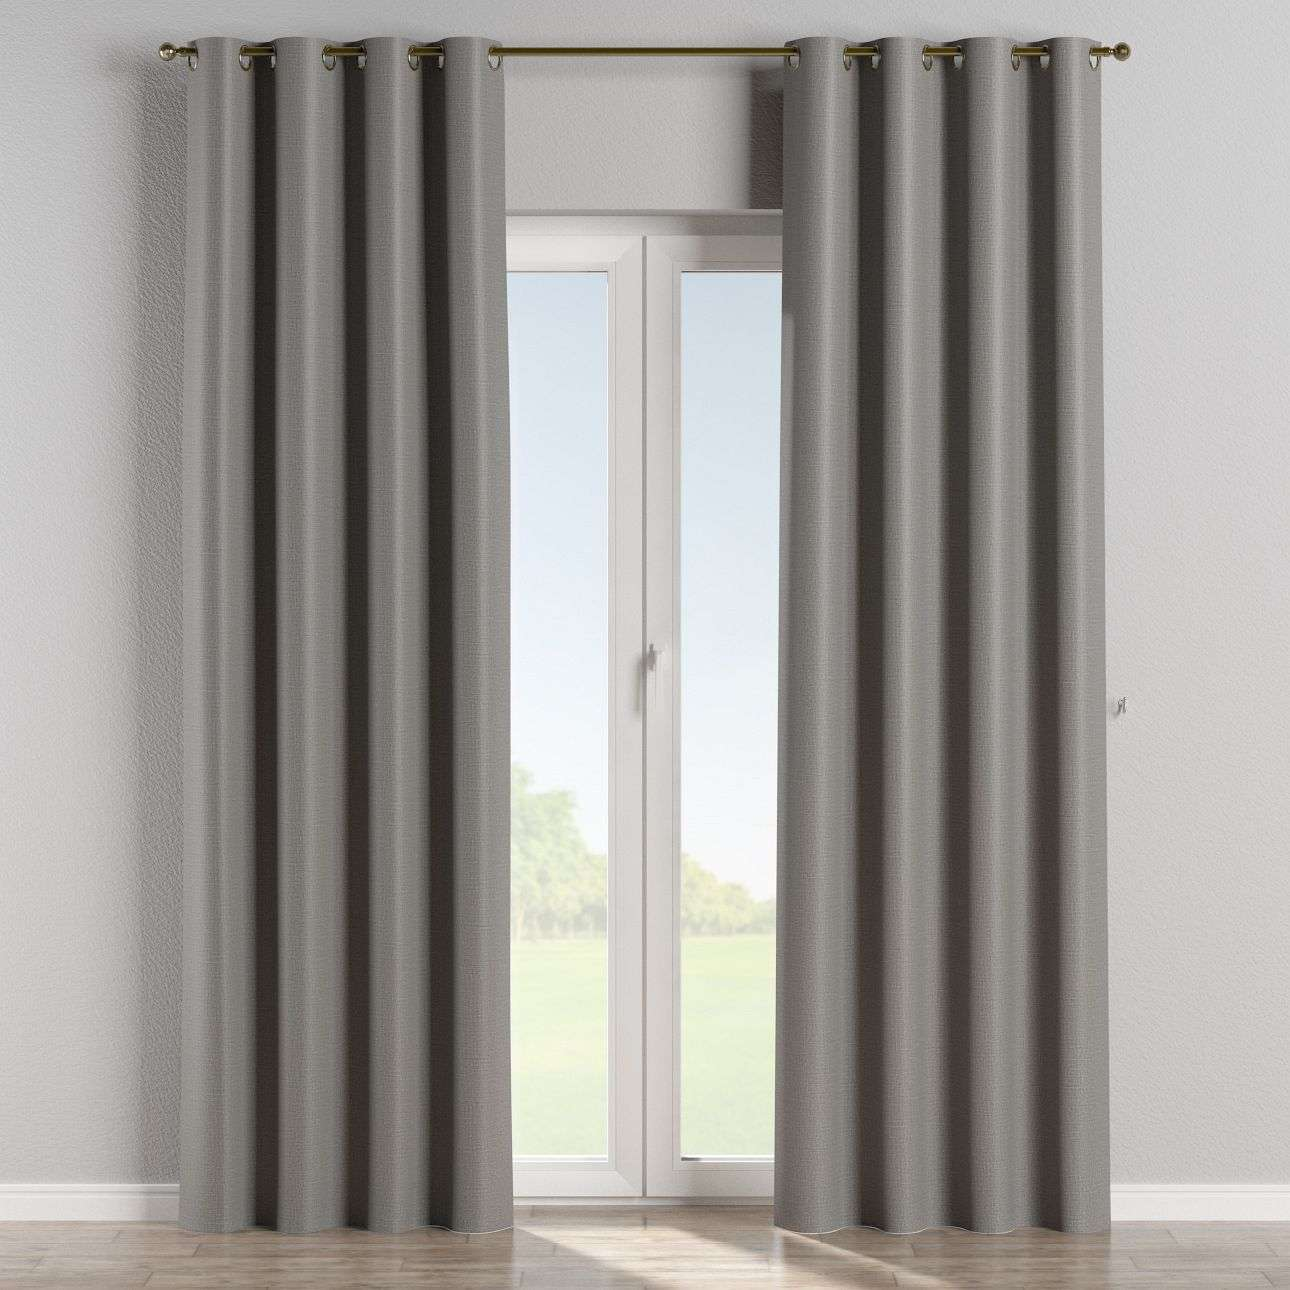 verdunklungsvorhang mit sen dunkelgrau dekoria. Black Bedroom Furniture Sets. Home Design Ideas